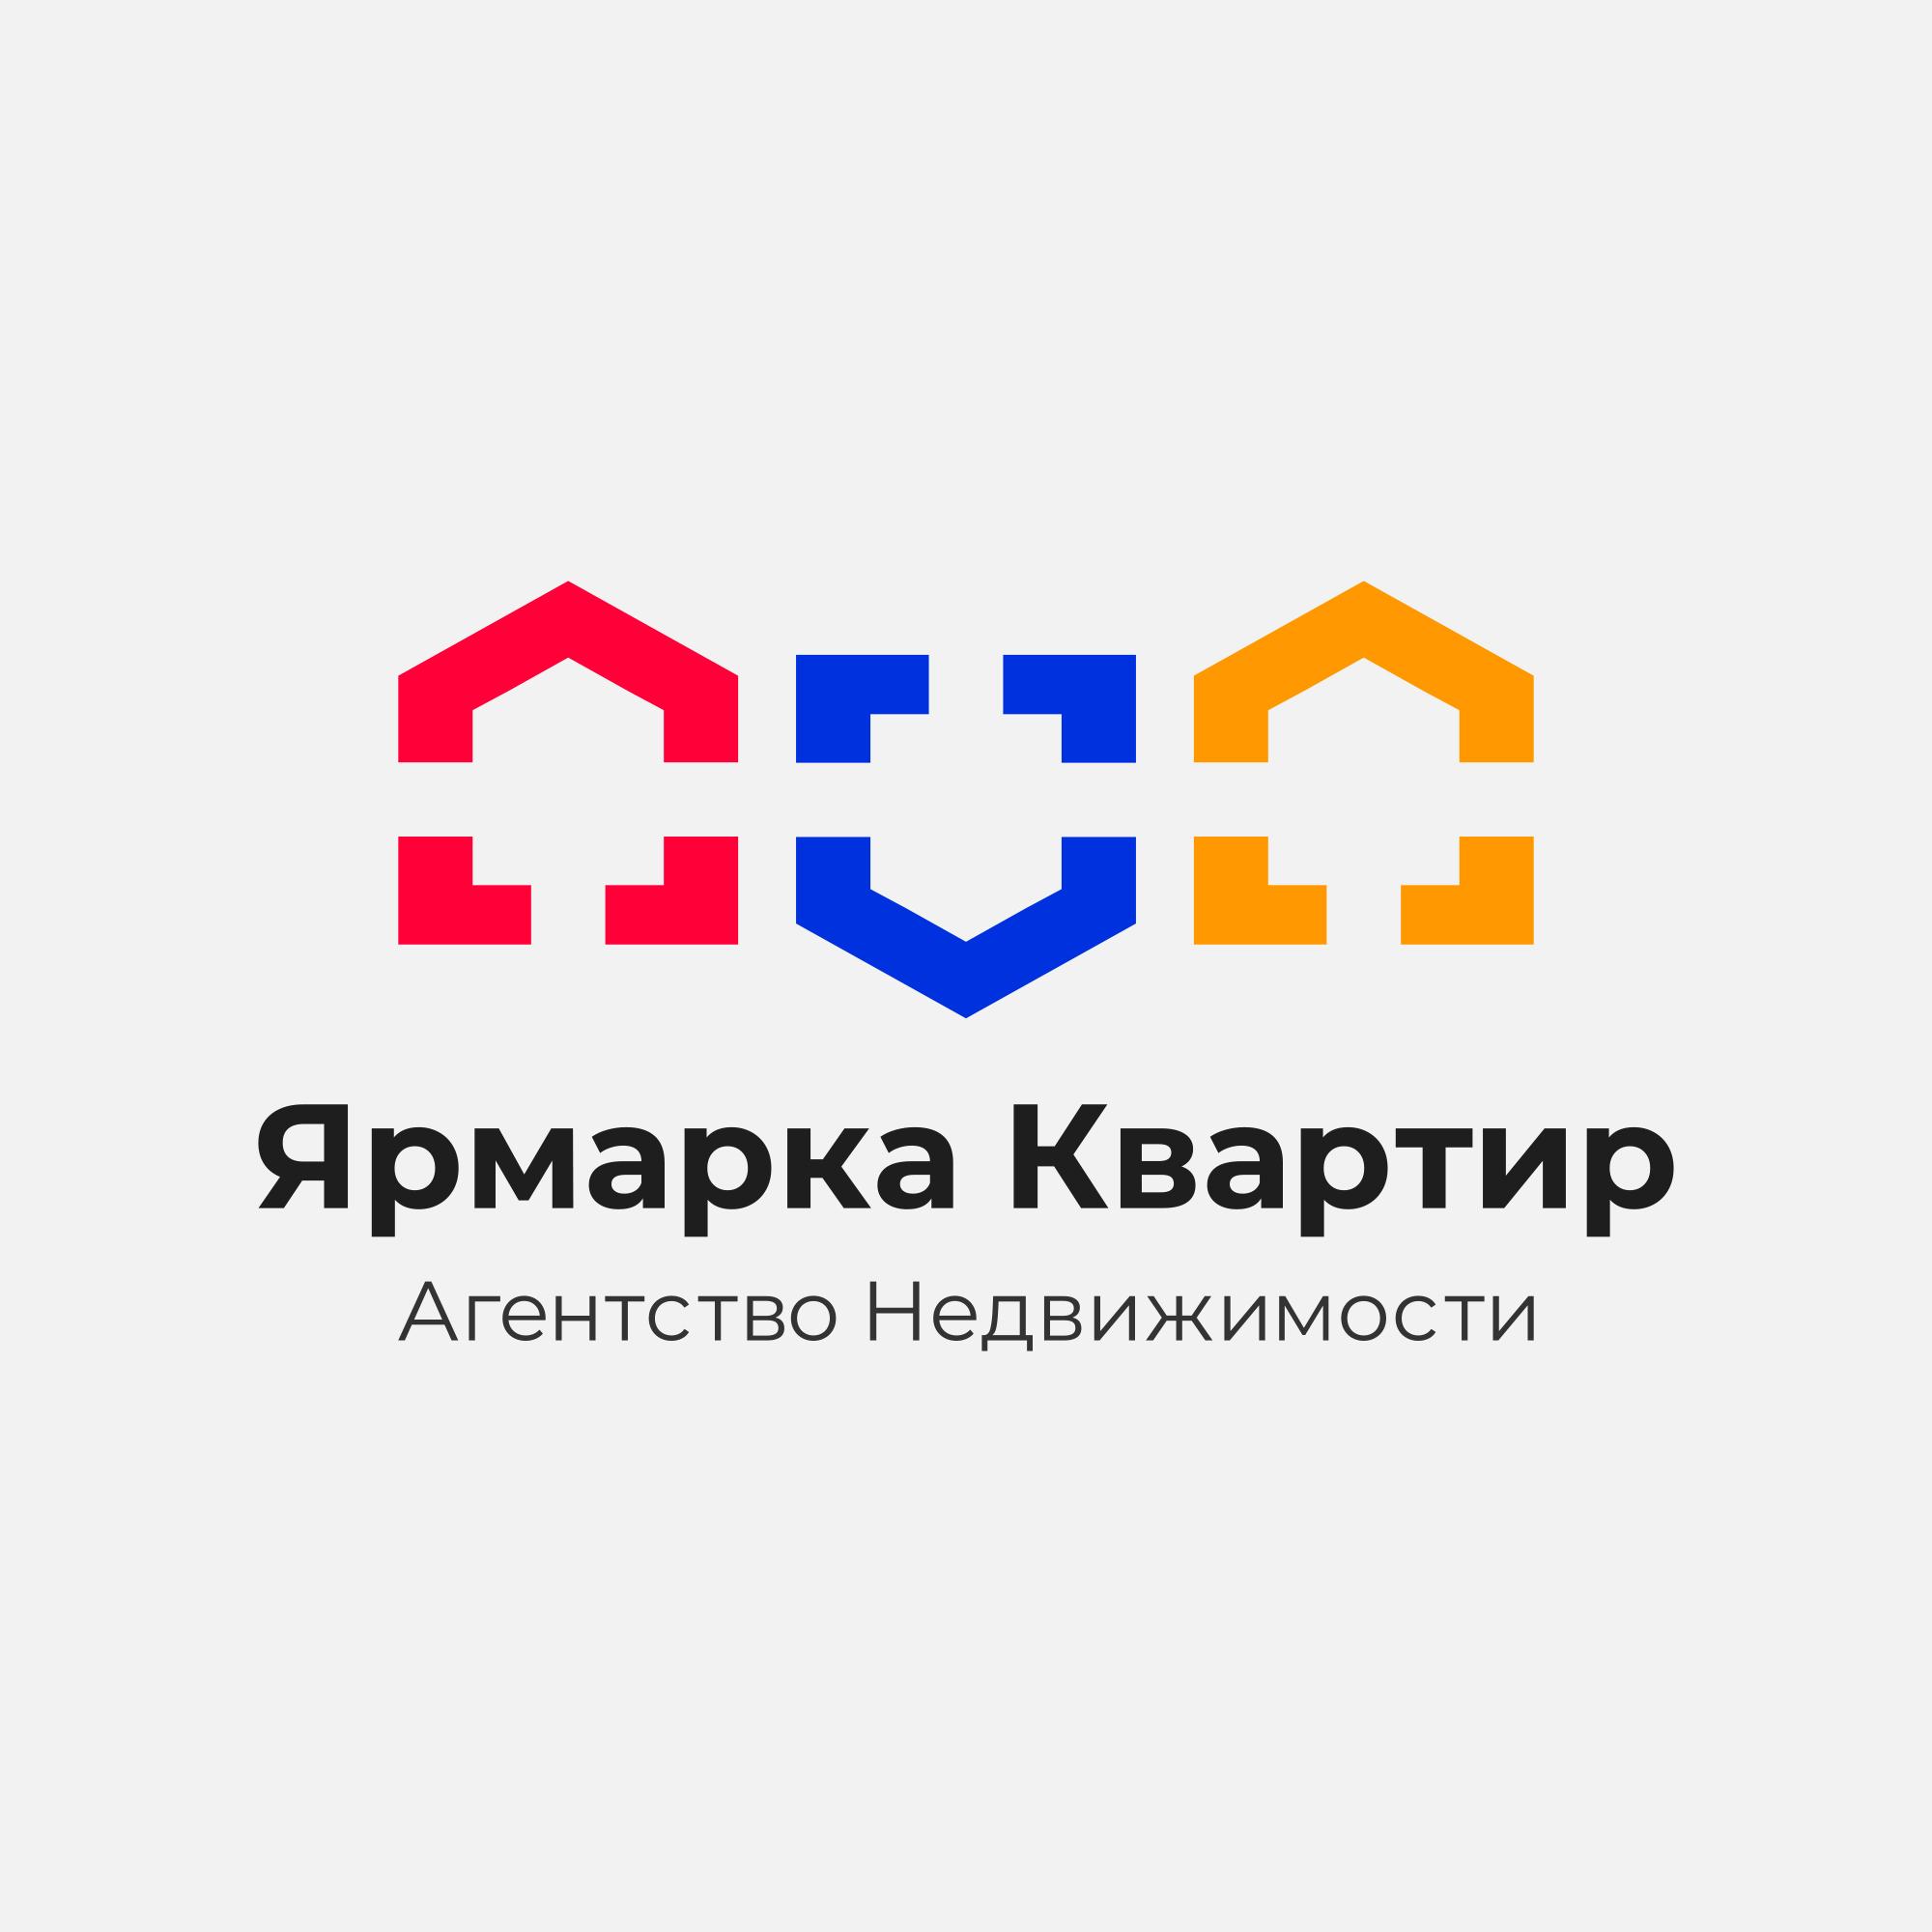 Создание логотипа, с вариантами для визитки и листовки фото f_27060084952eb789.jpg